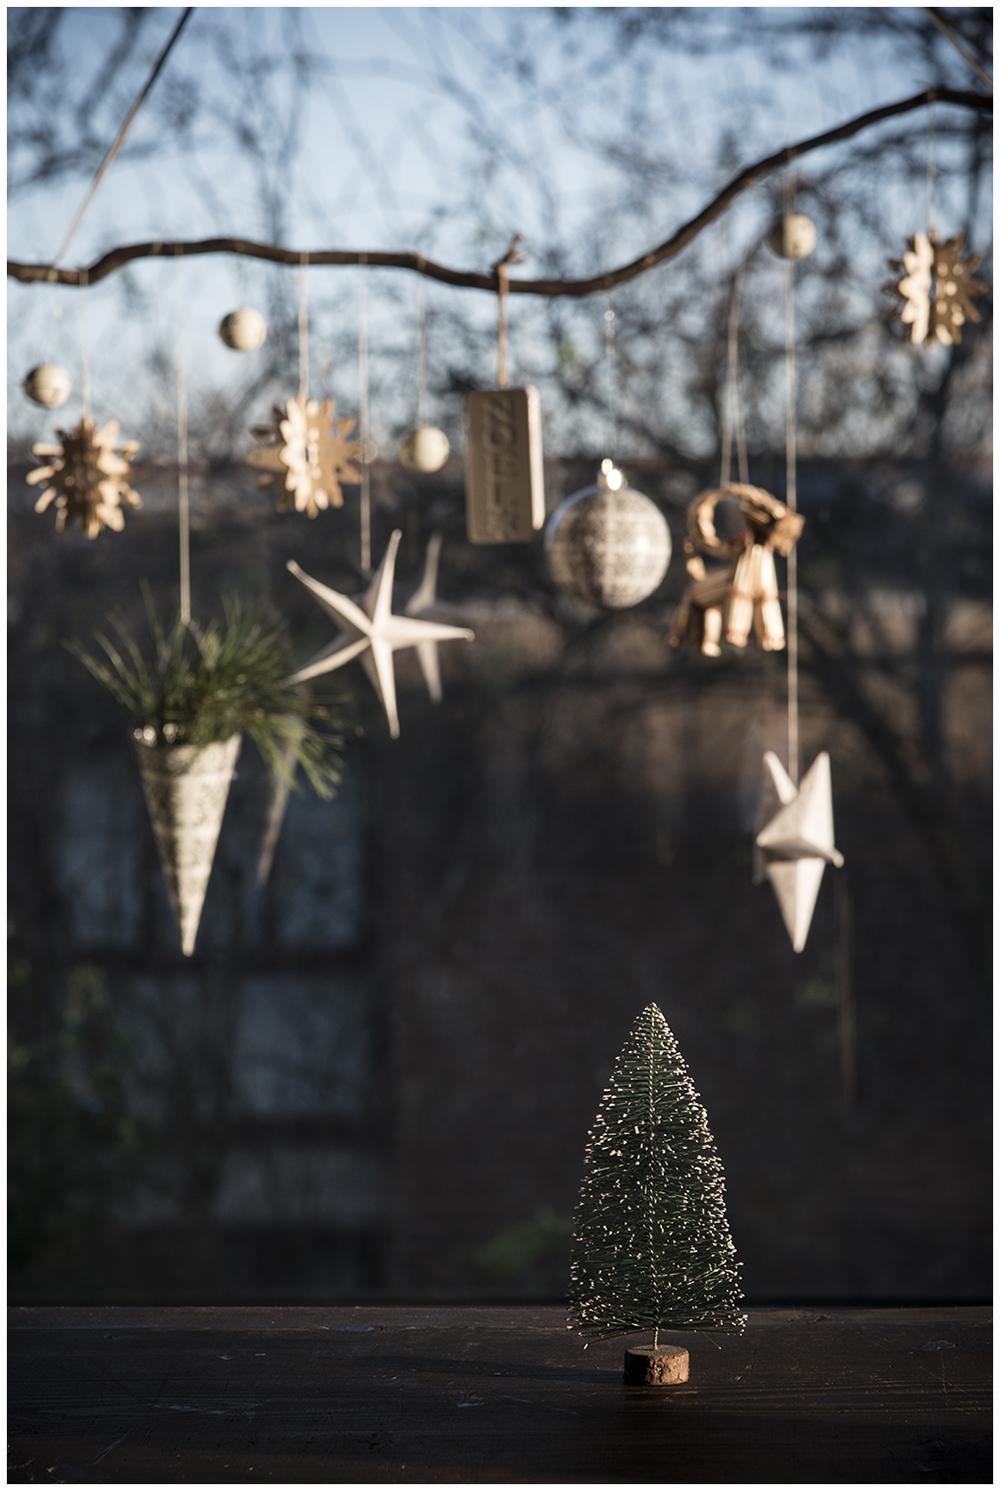 Christmas decorations and winter sunshine